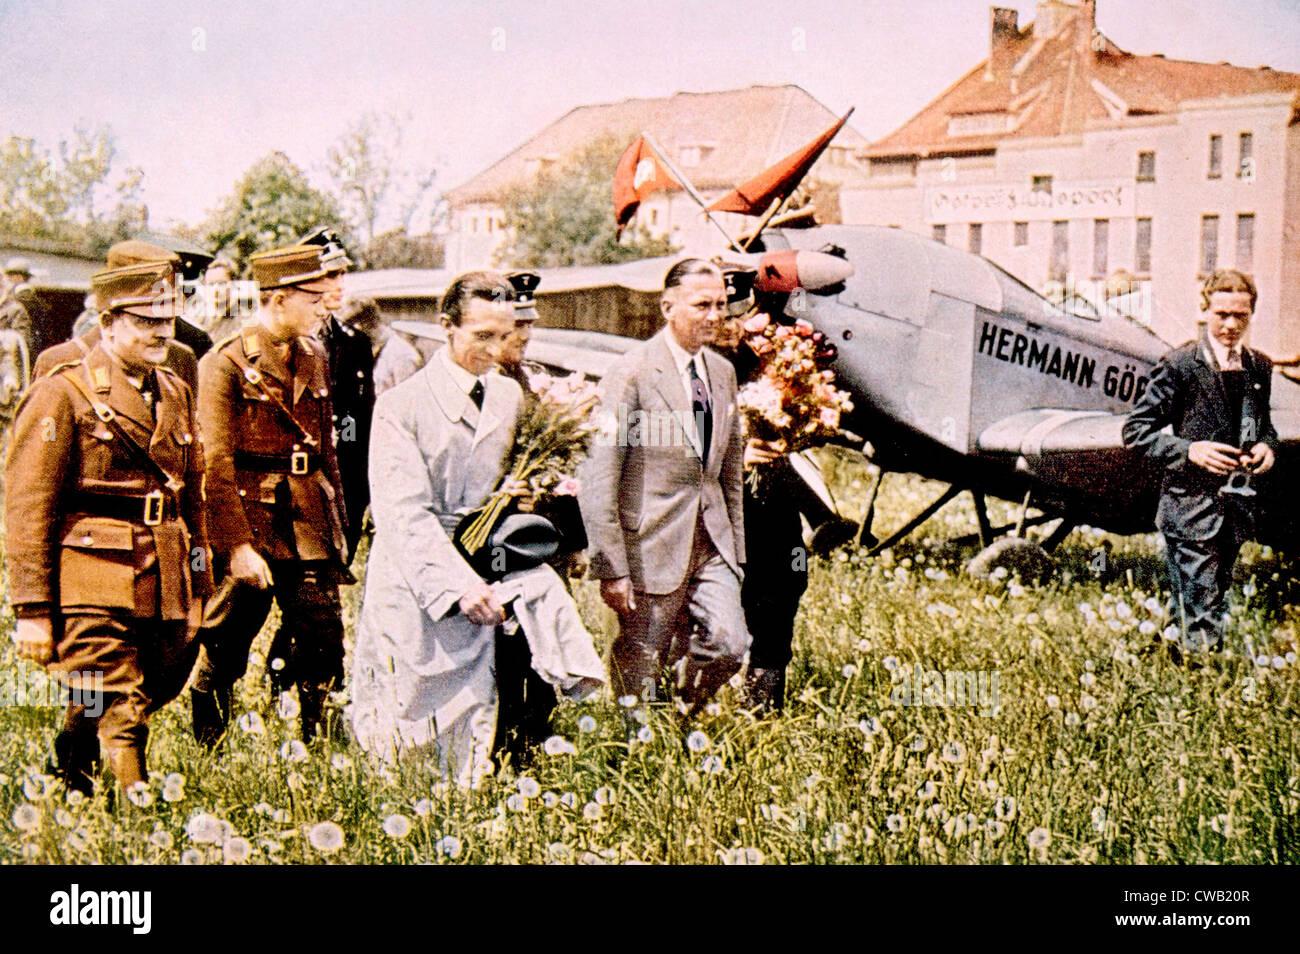 Joseph Goebbels (foreground, center), at the Konigsberg airport, c. 1933. - Stock Image